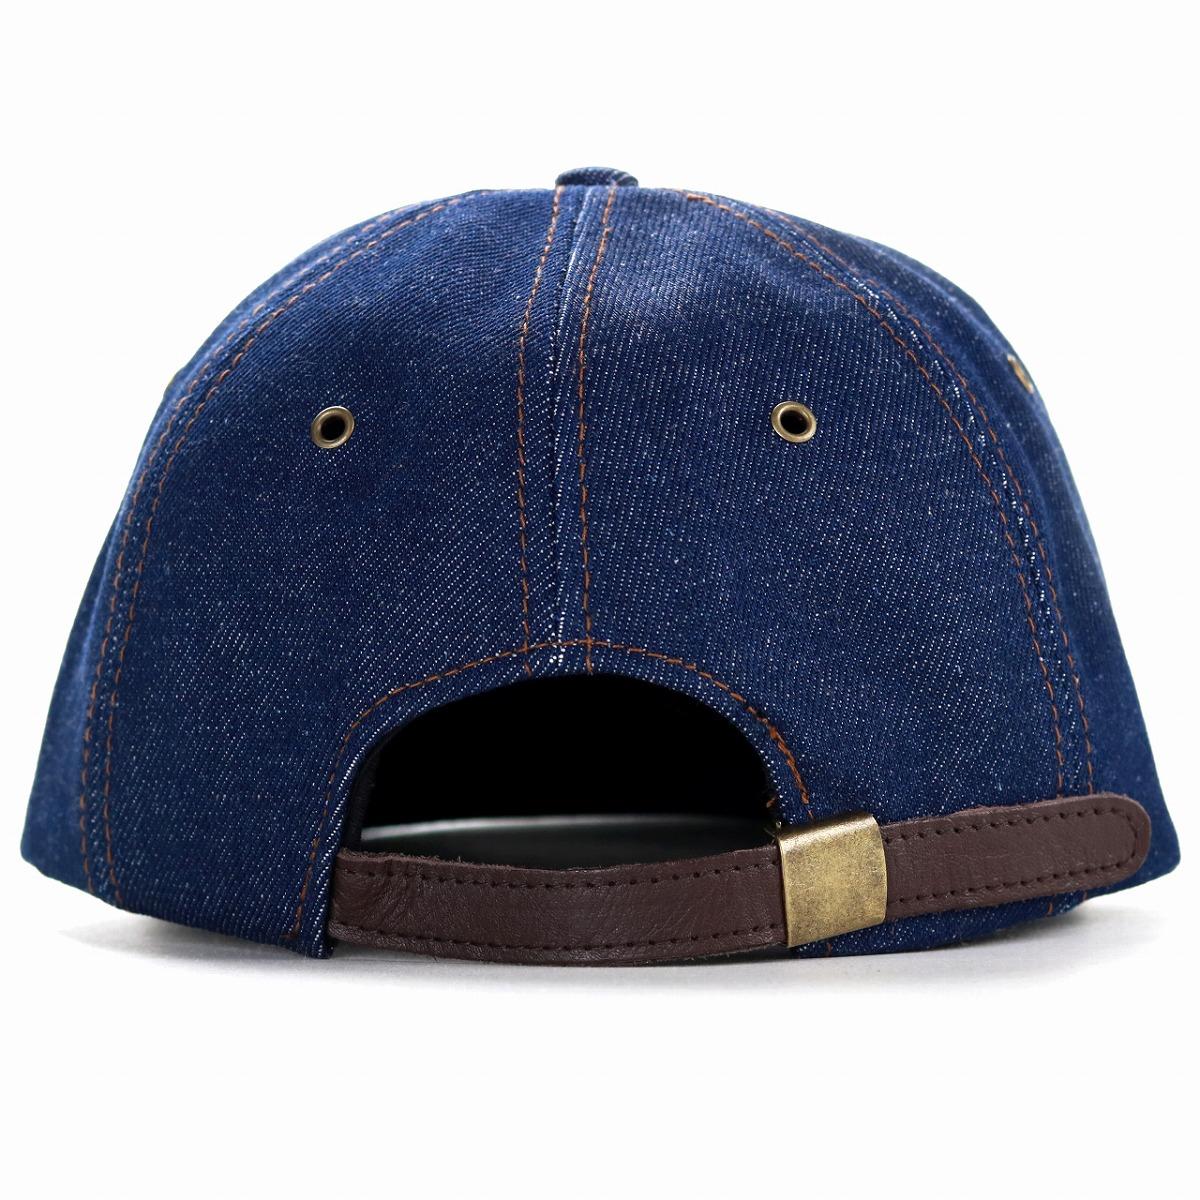 ... NEW YORK HAT blue blue denim baseball cap Shin pull plain fabric  adjustable size unisex ... 19b6e49a528